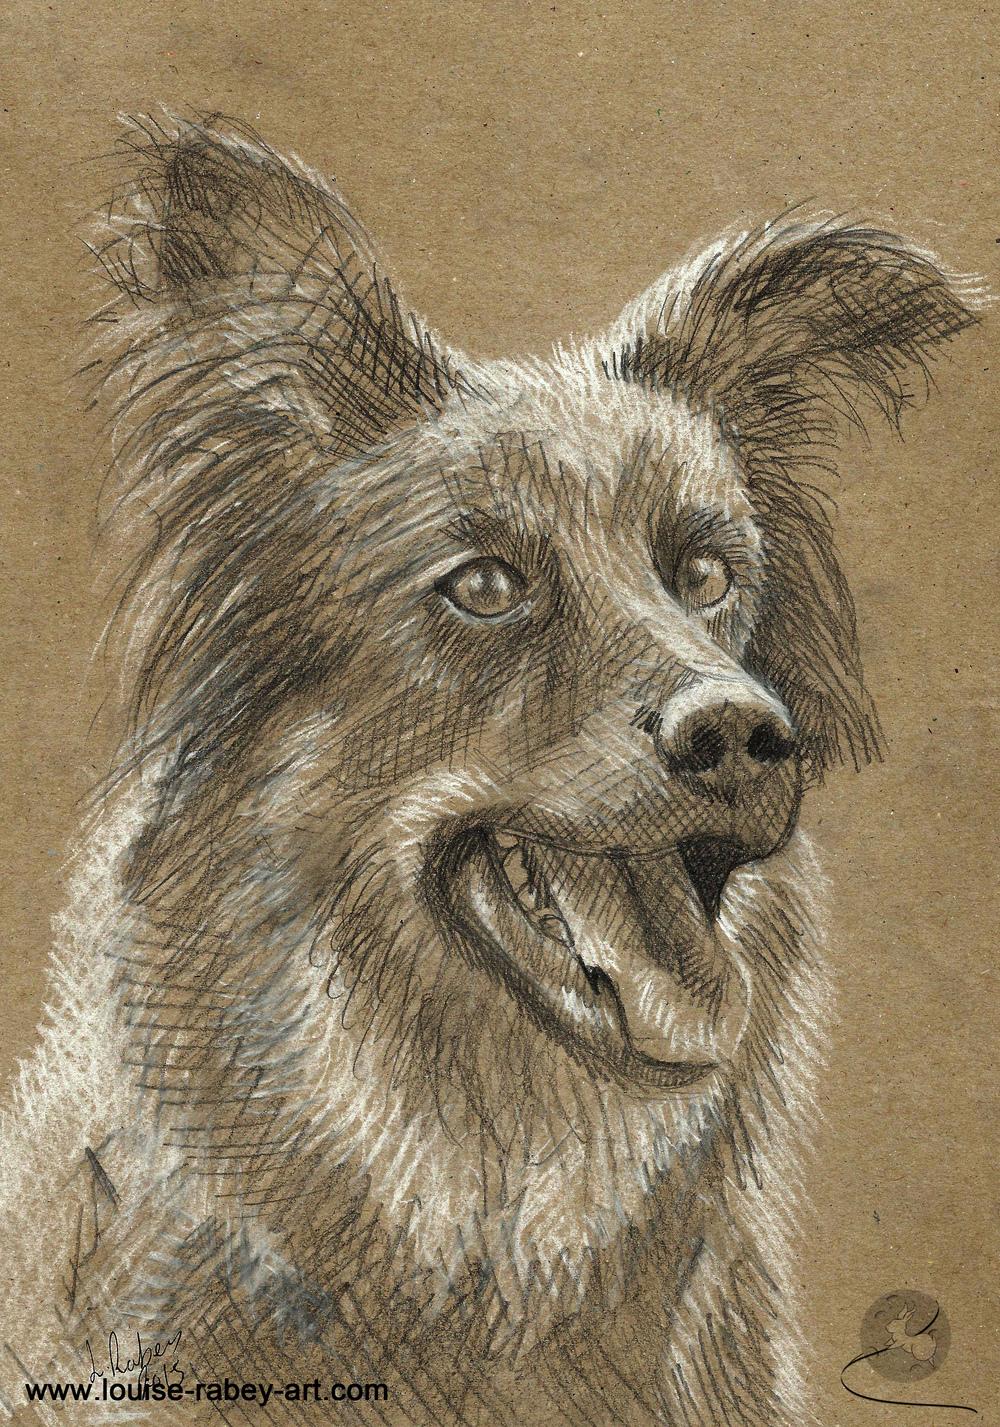 008 Dog sketch portrait.jpg